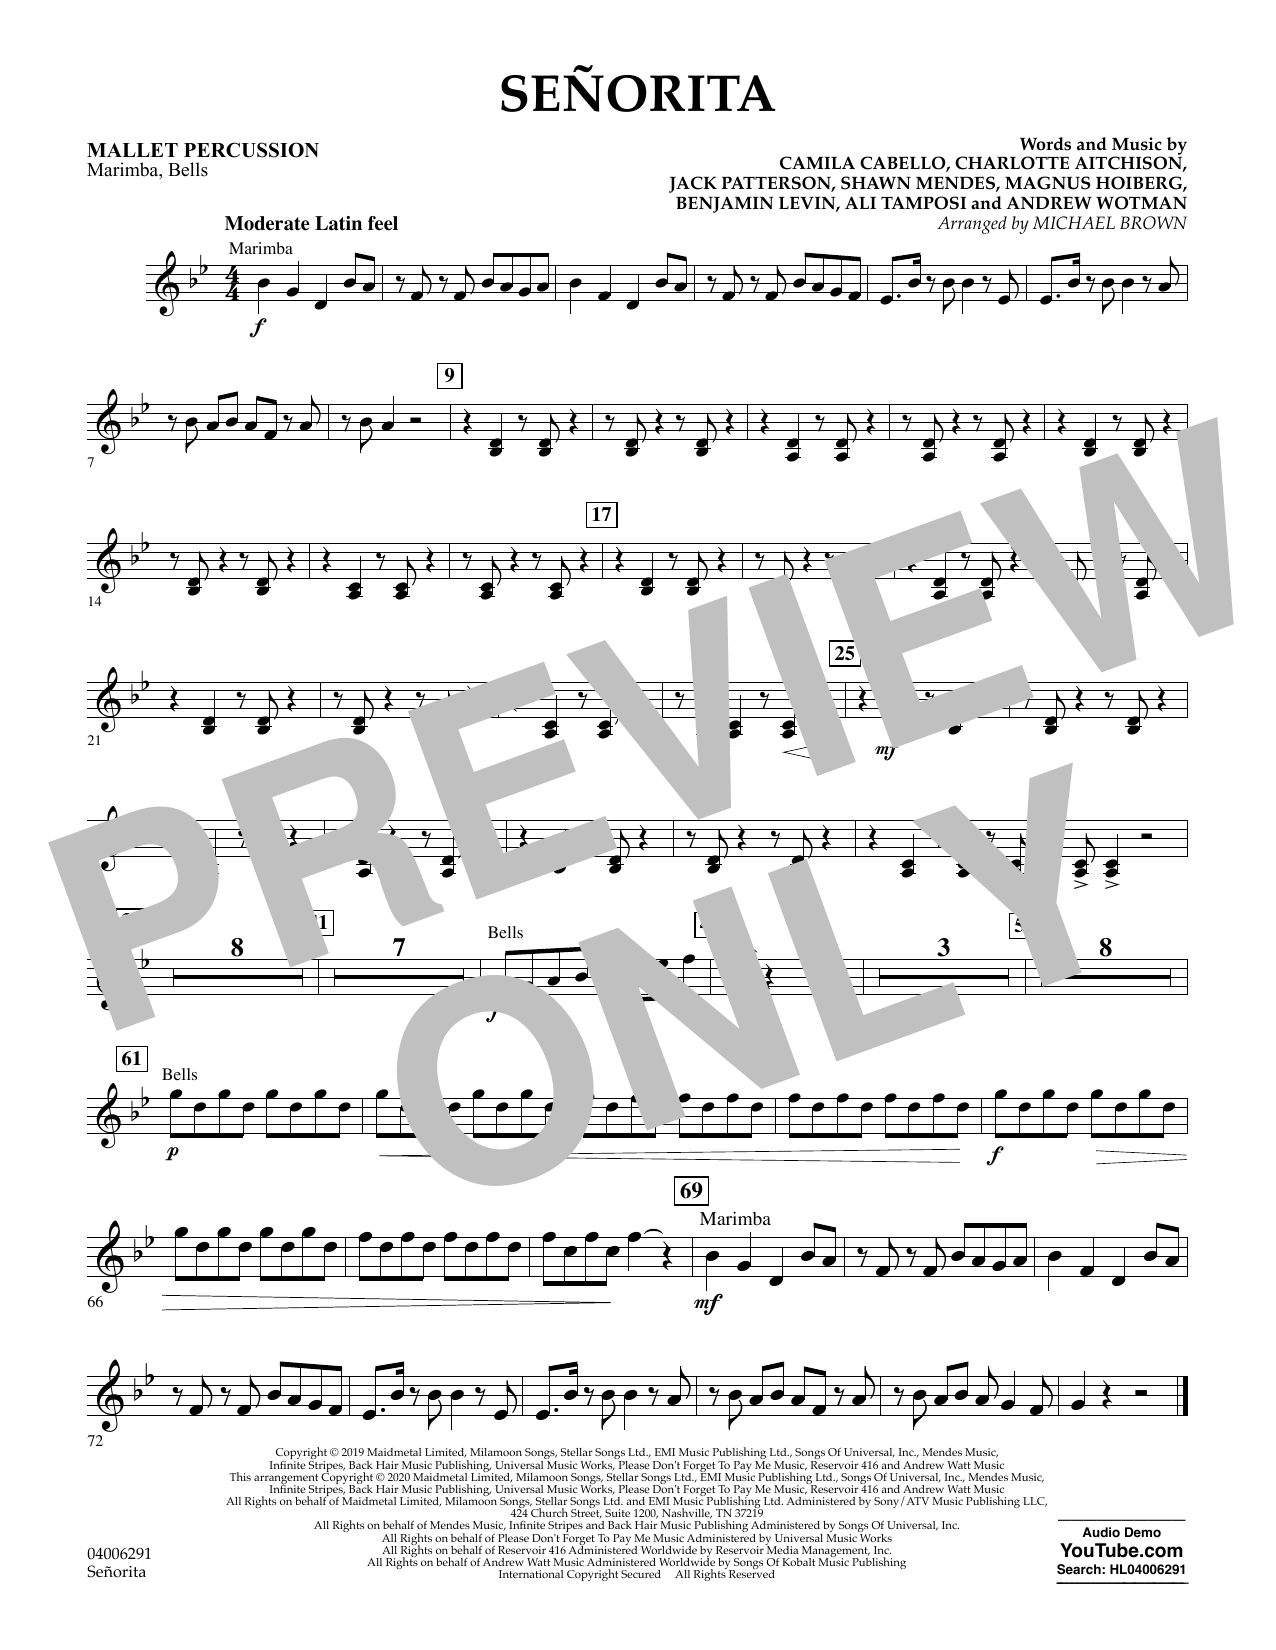 Señorita (arr. Michael Brown) - Mallet Percussion (Concert Band)